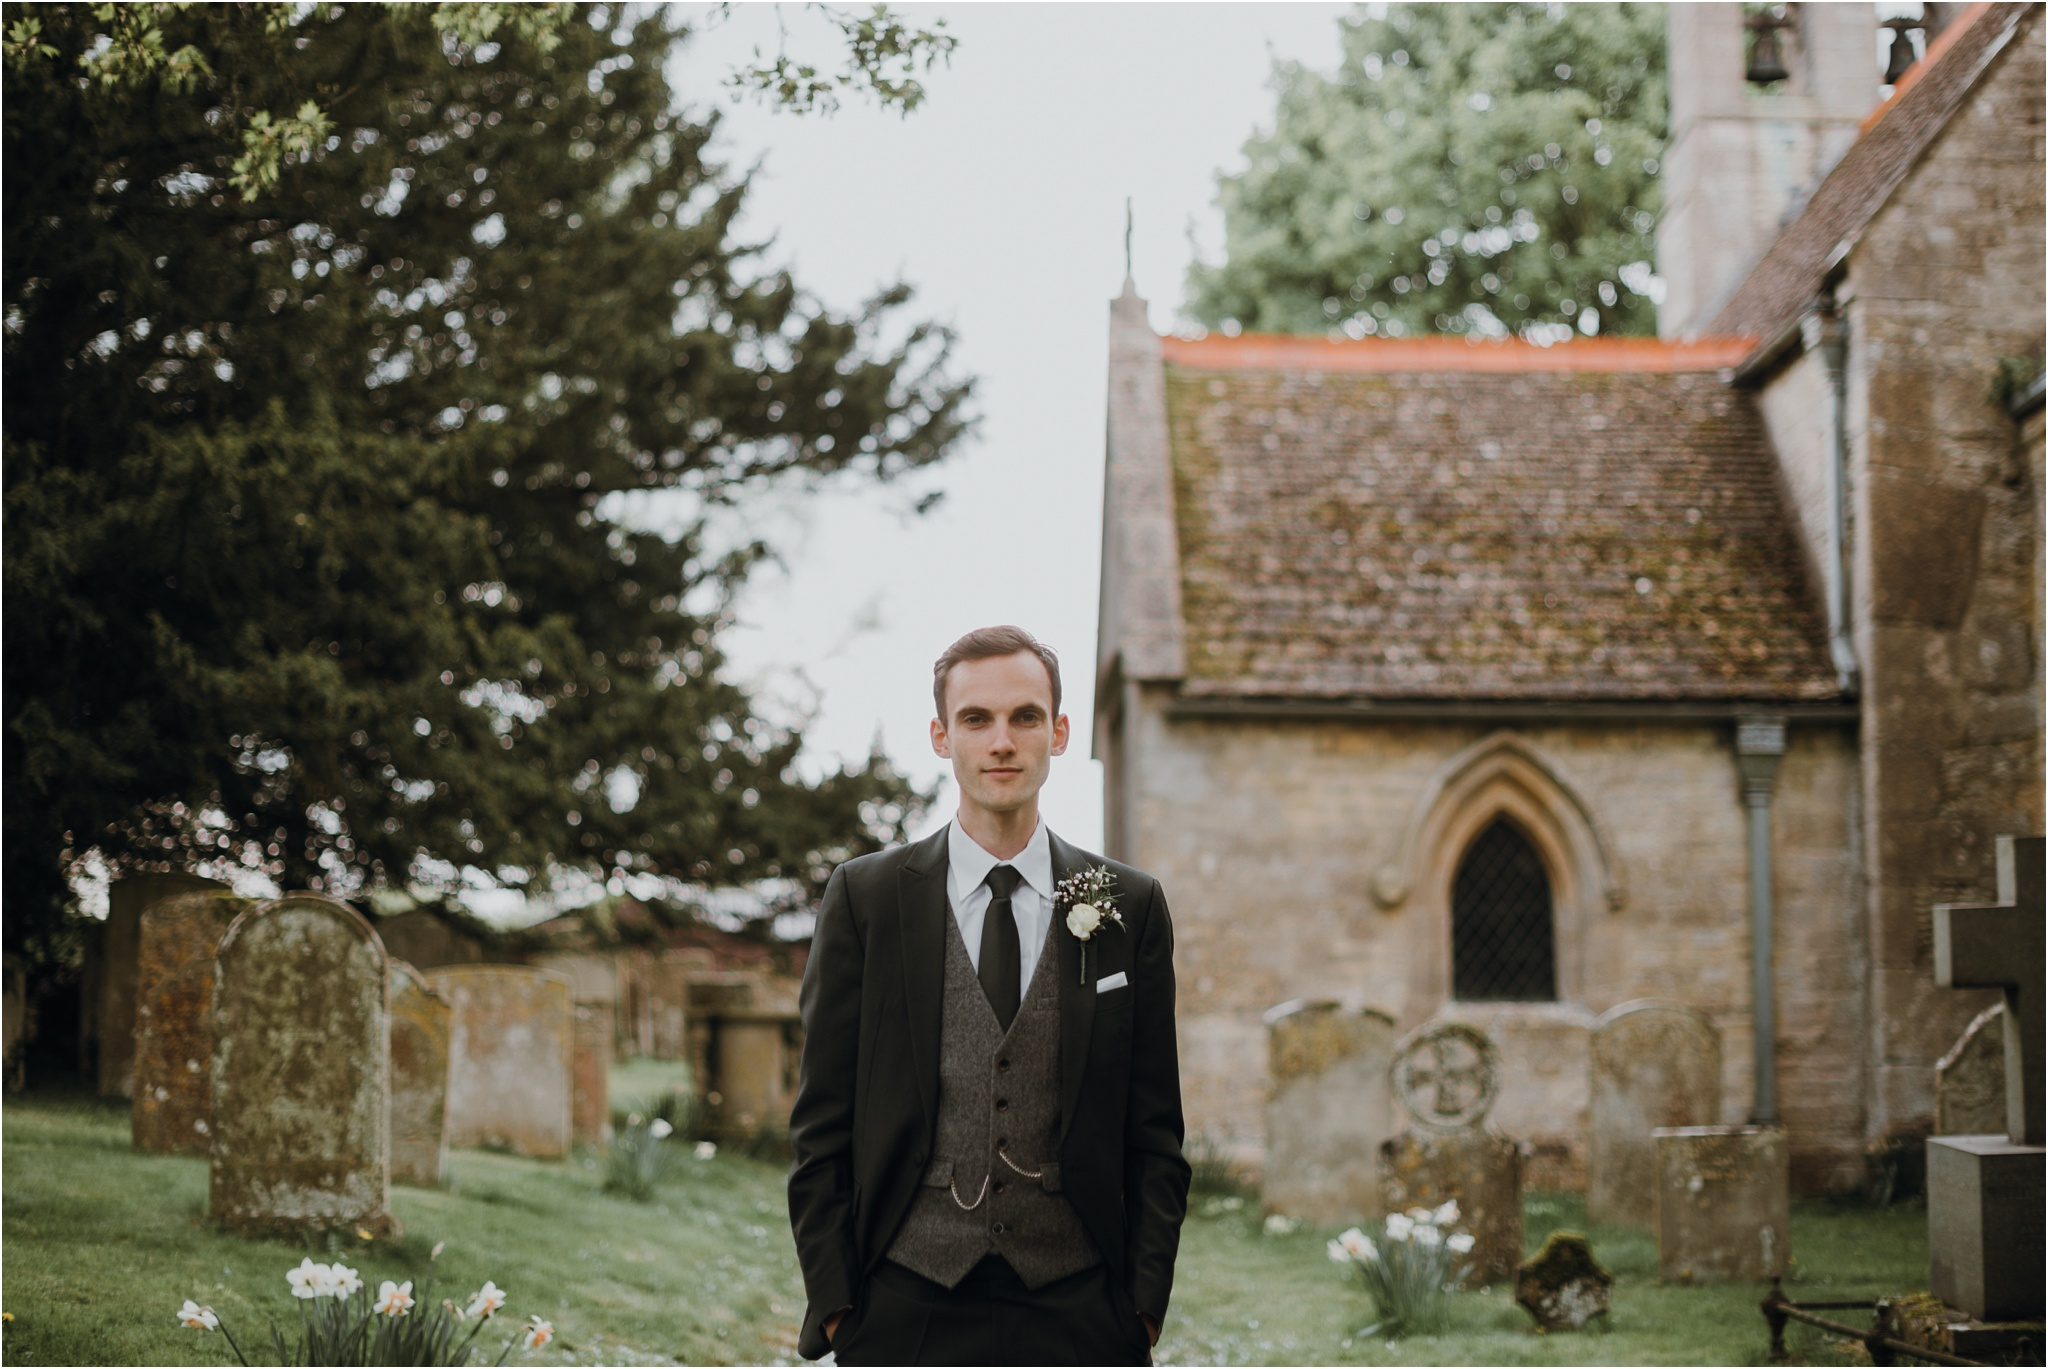 Outdoor-country-wedding-Edinburgh-photographer__0089.jpg